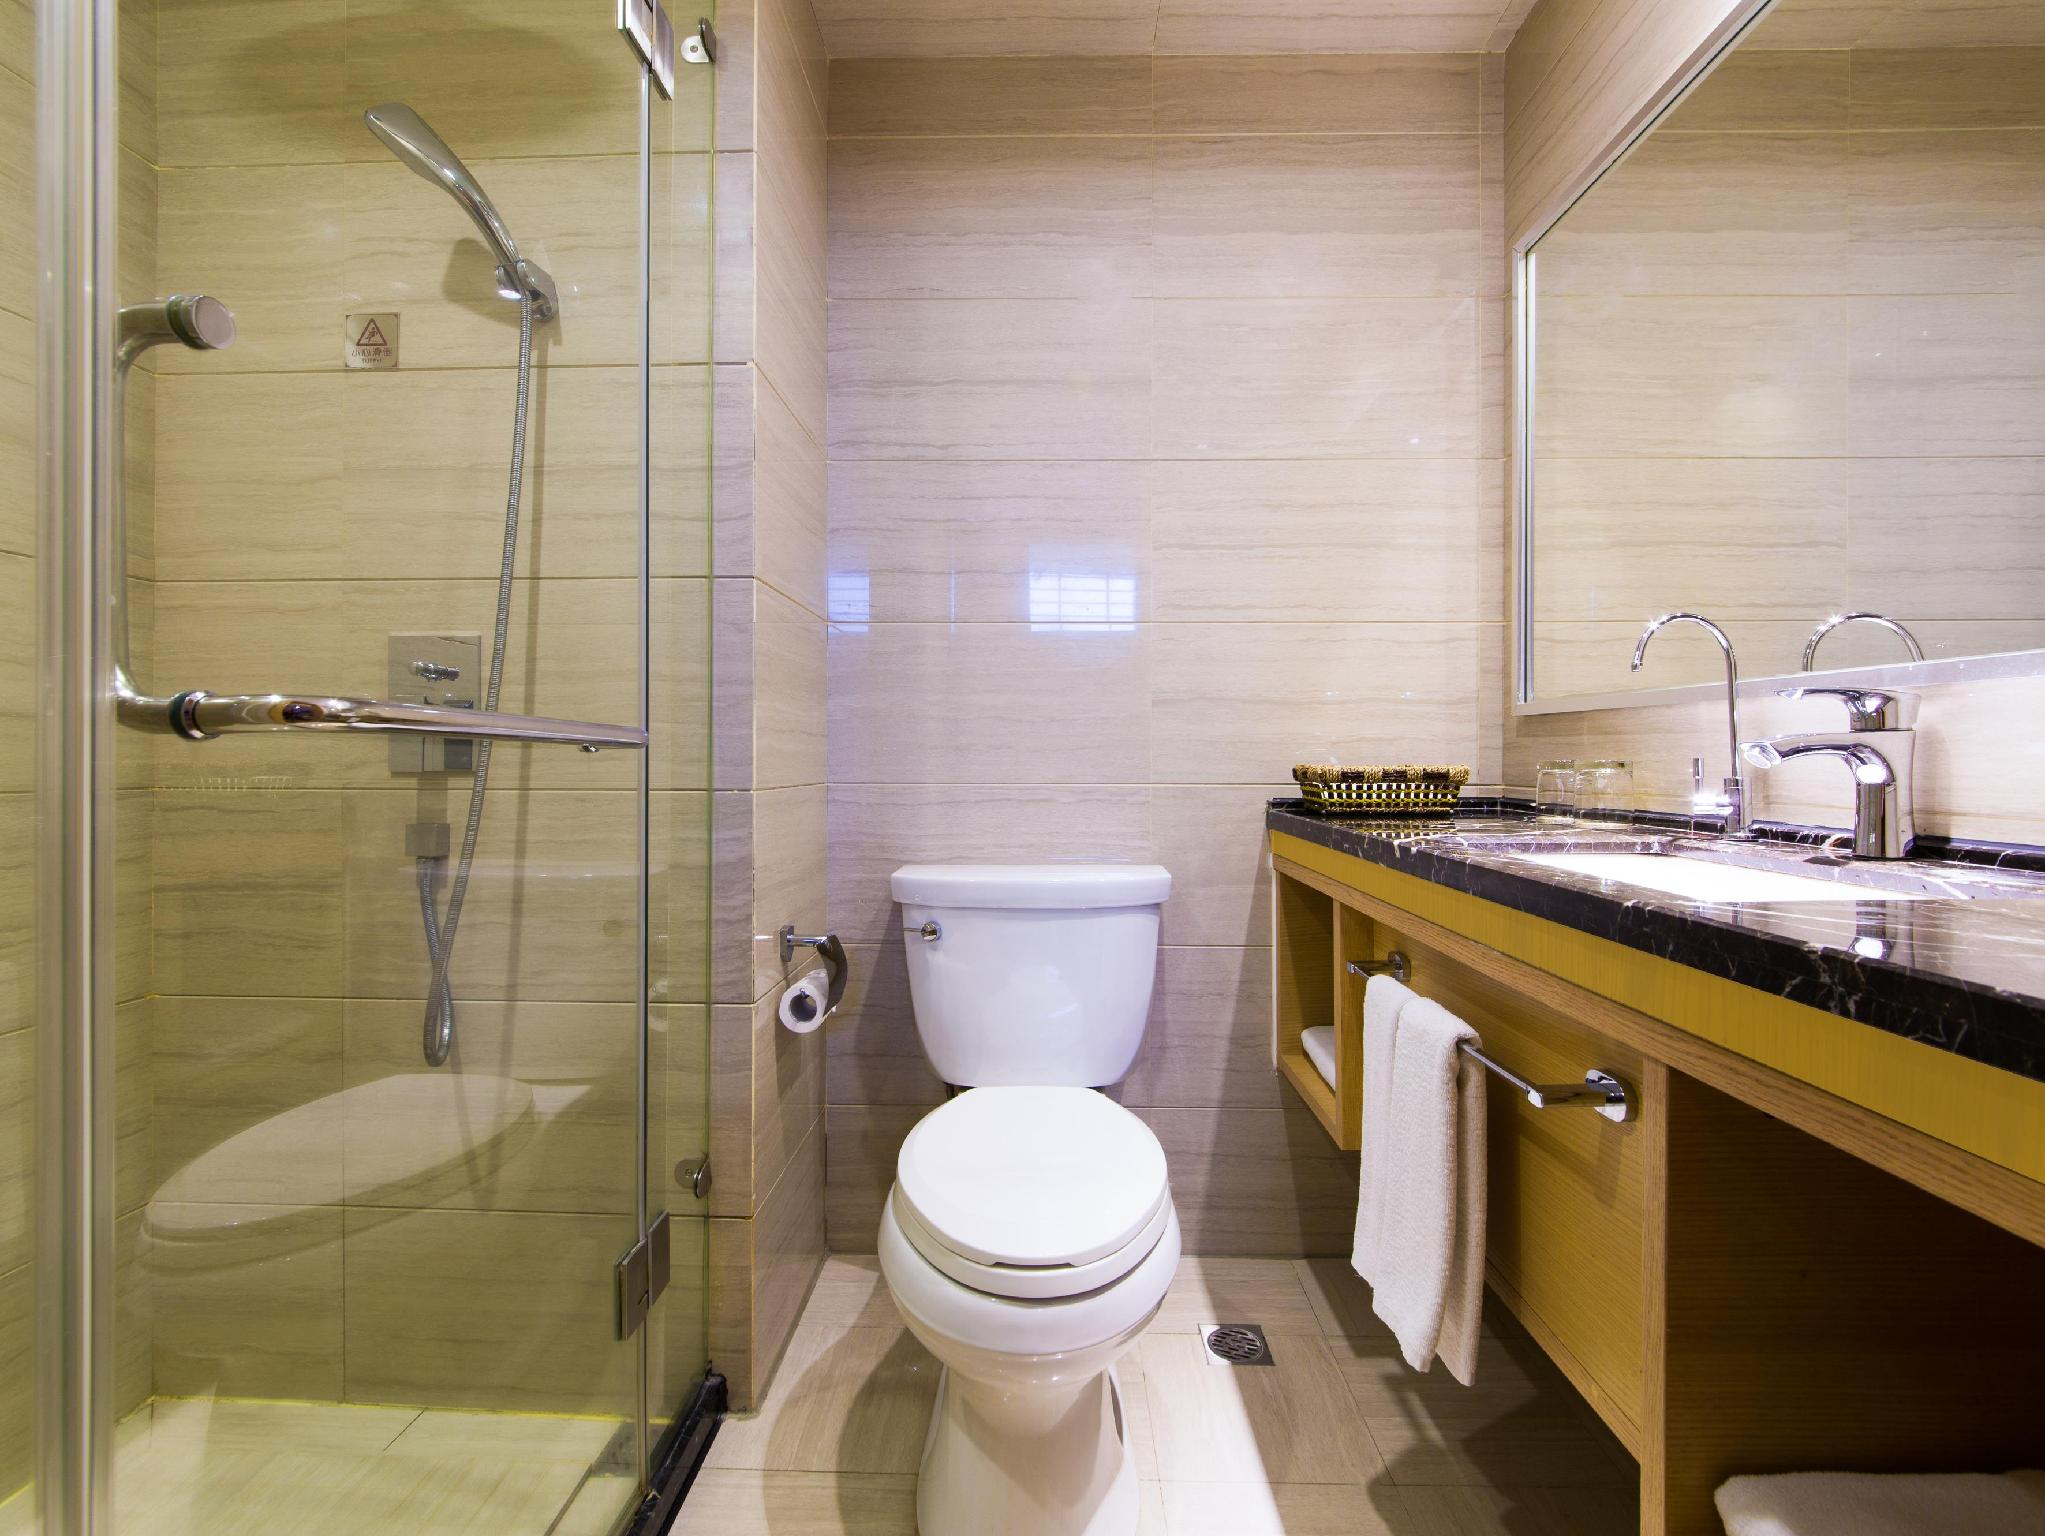 Yiwu Bali Yating Hotel, Jinhua